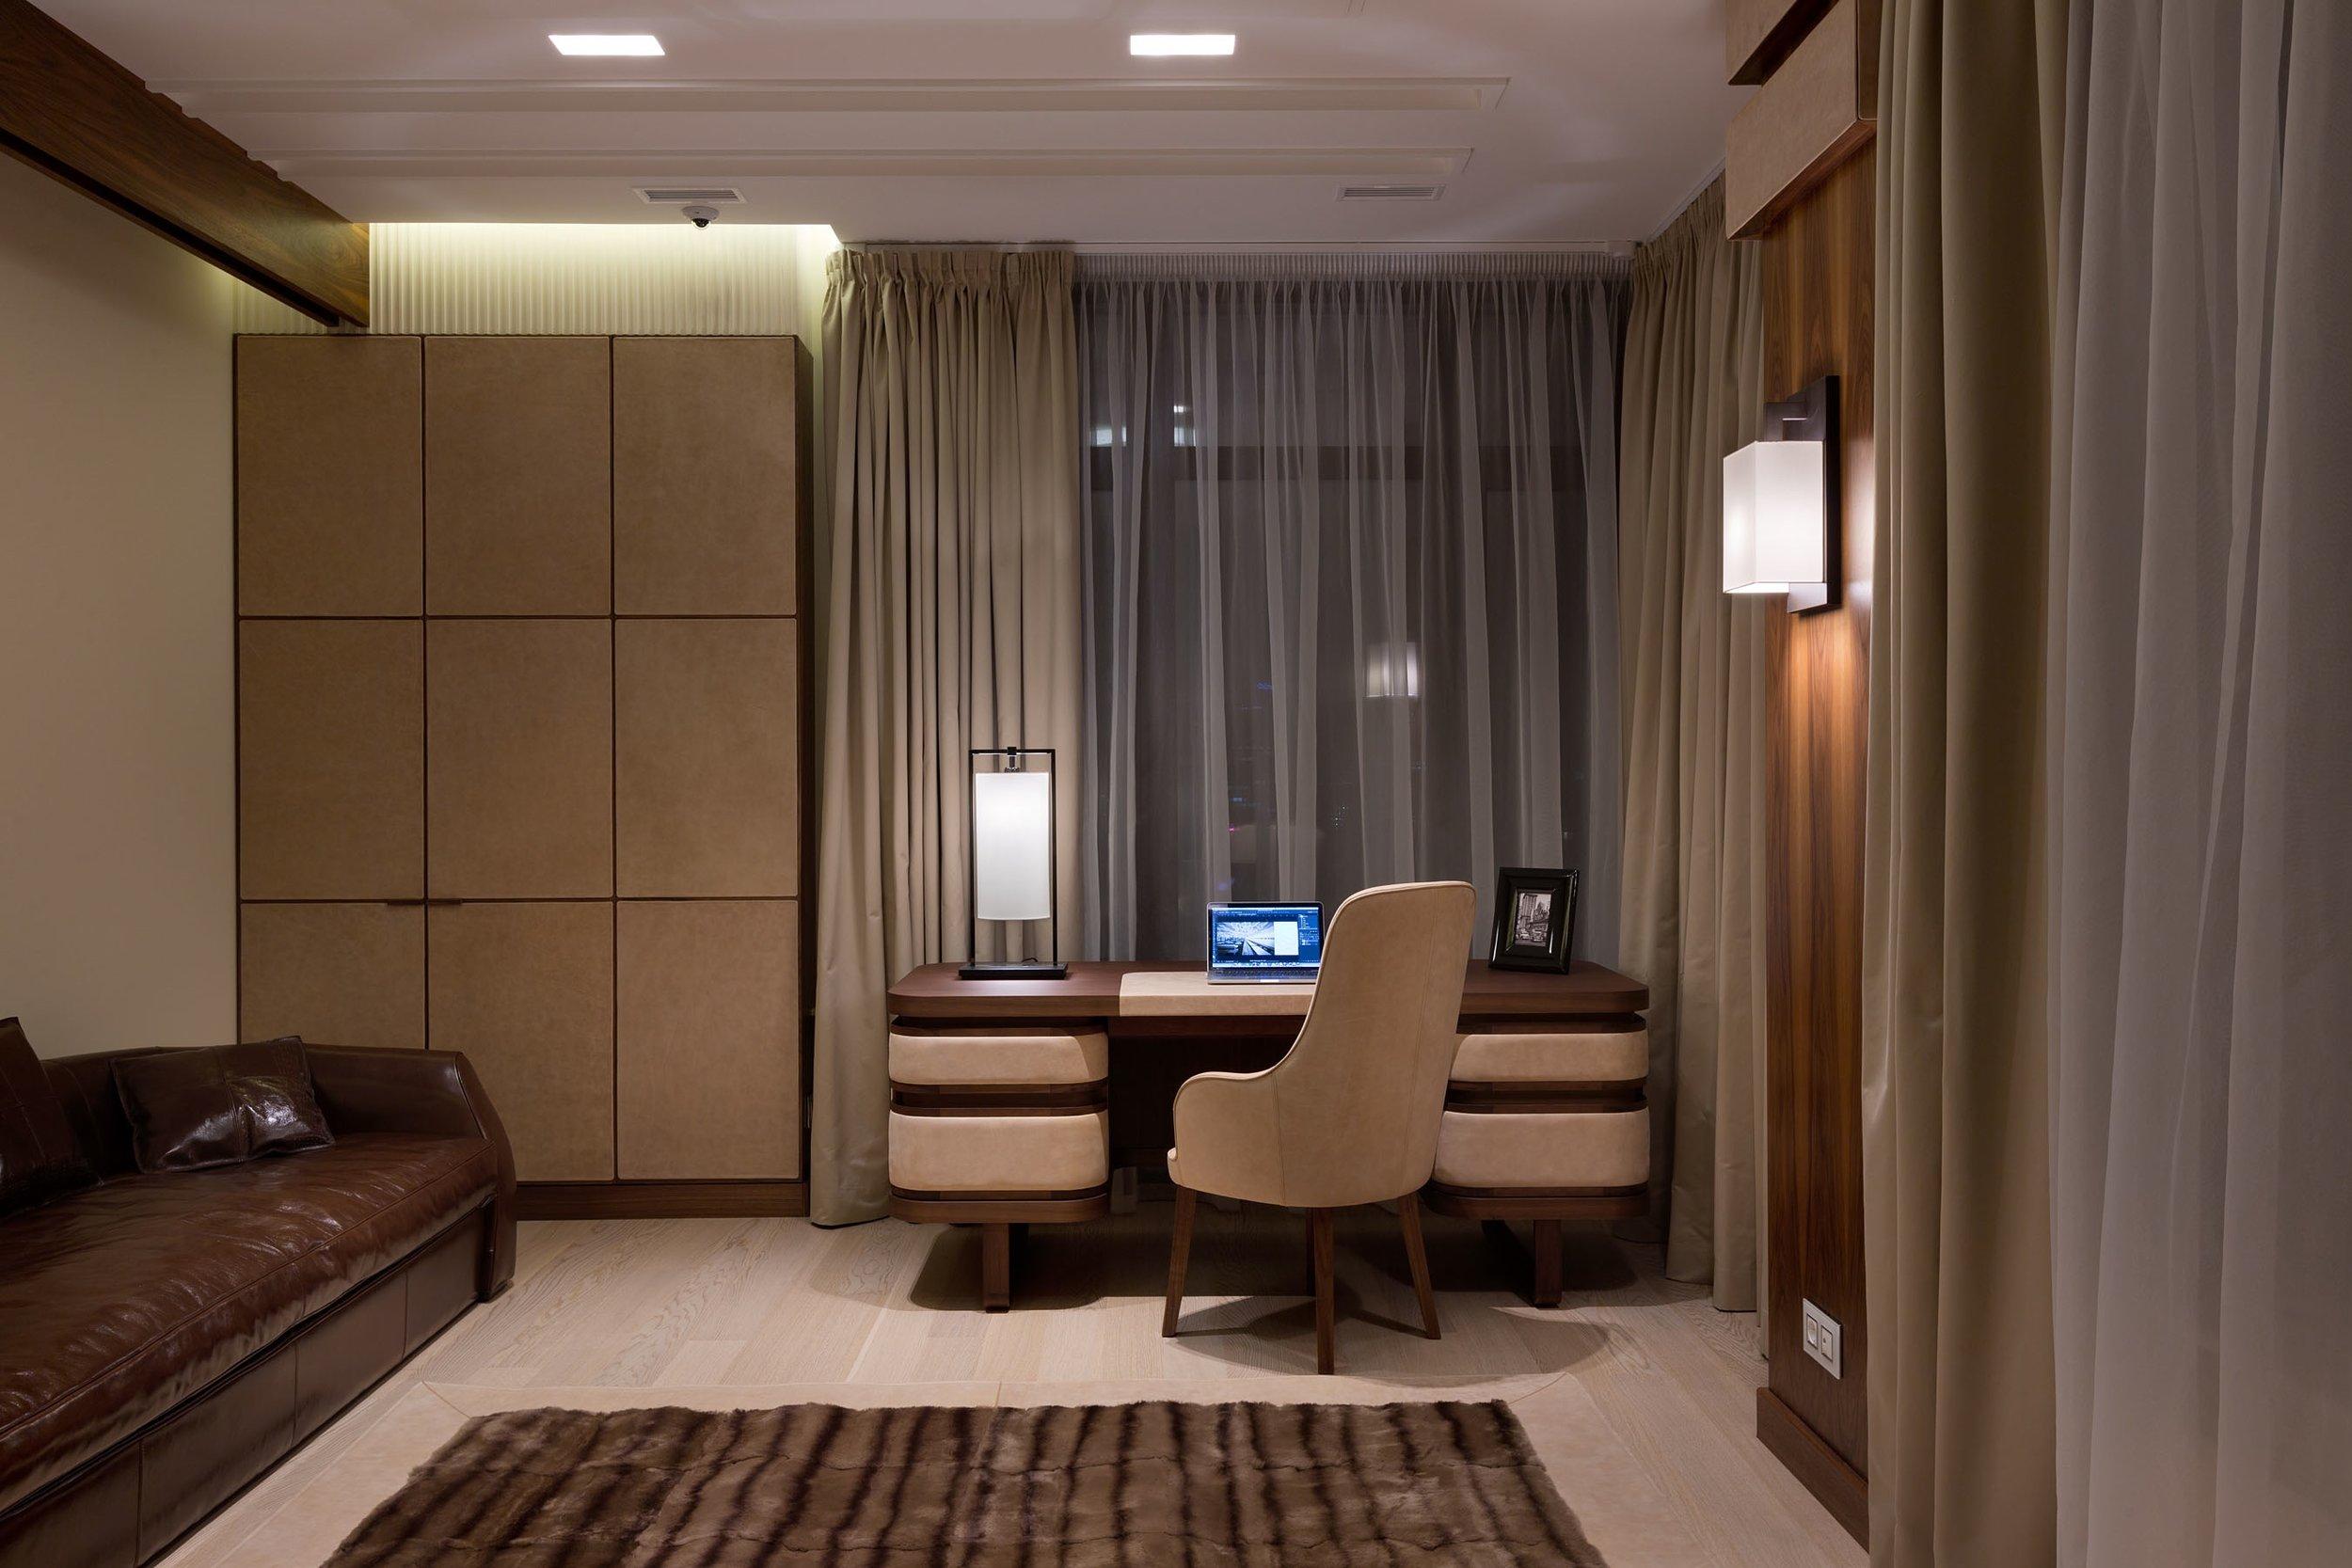 Ulivi Salotti Infinity line - Home office by Nataly Bolshakova Interior Design Studio - An Ode to Leathers @ Masha Shapiro Agency.jpg